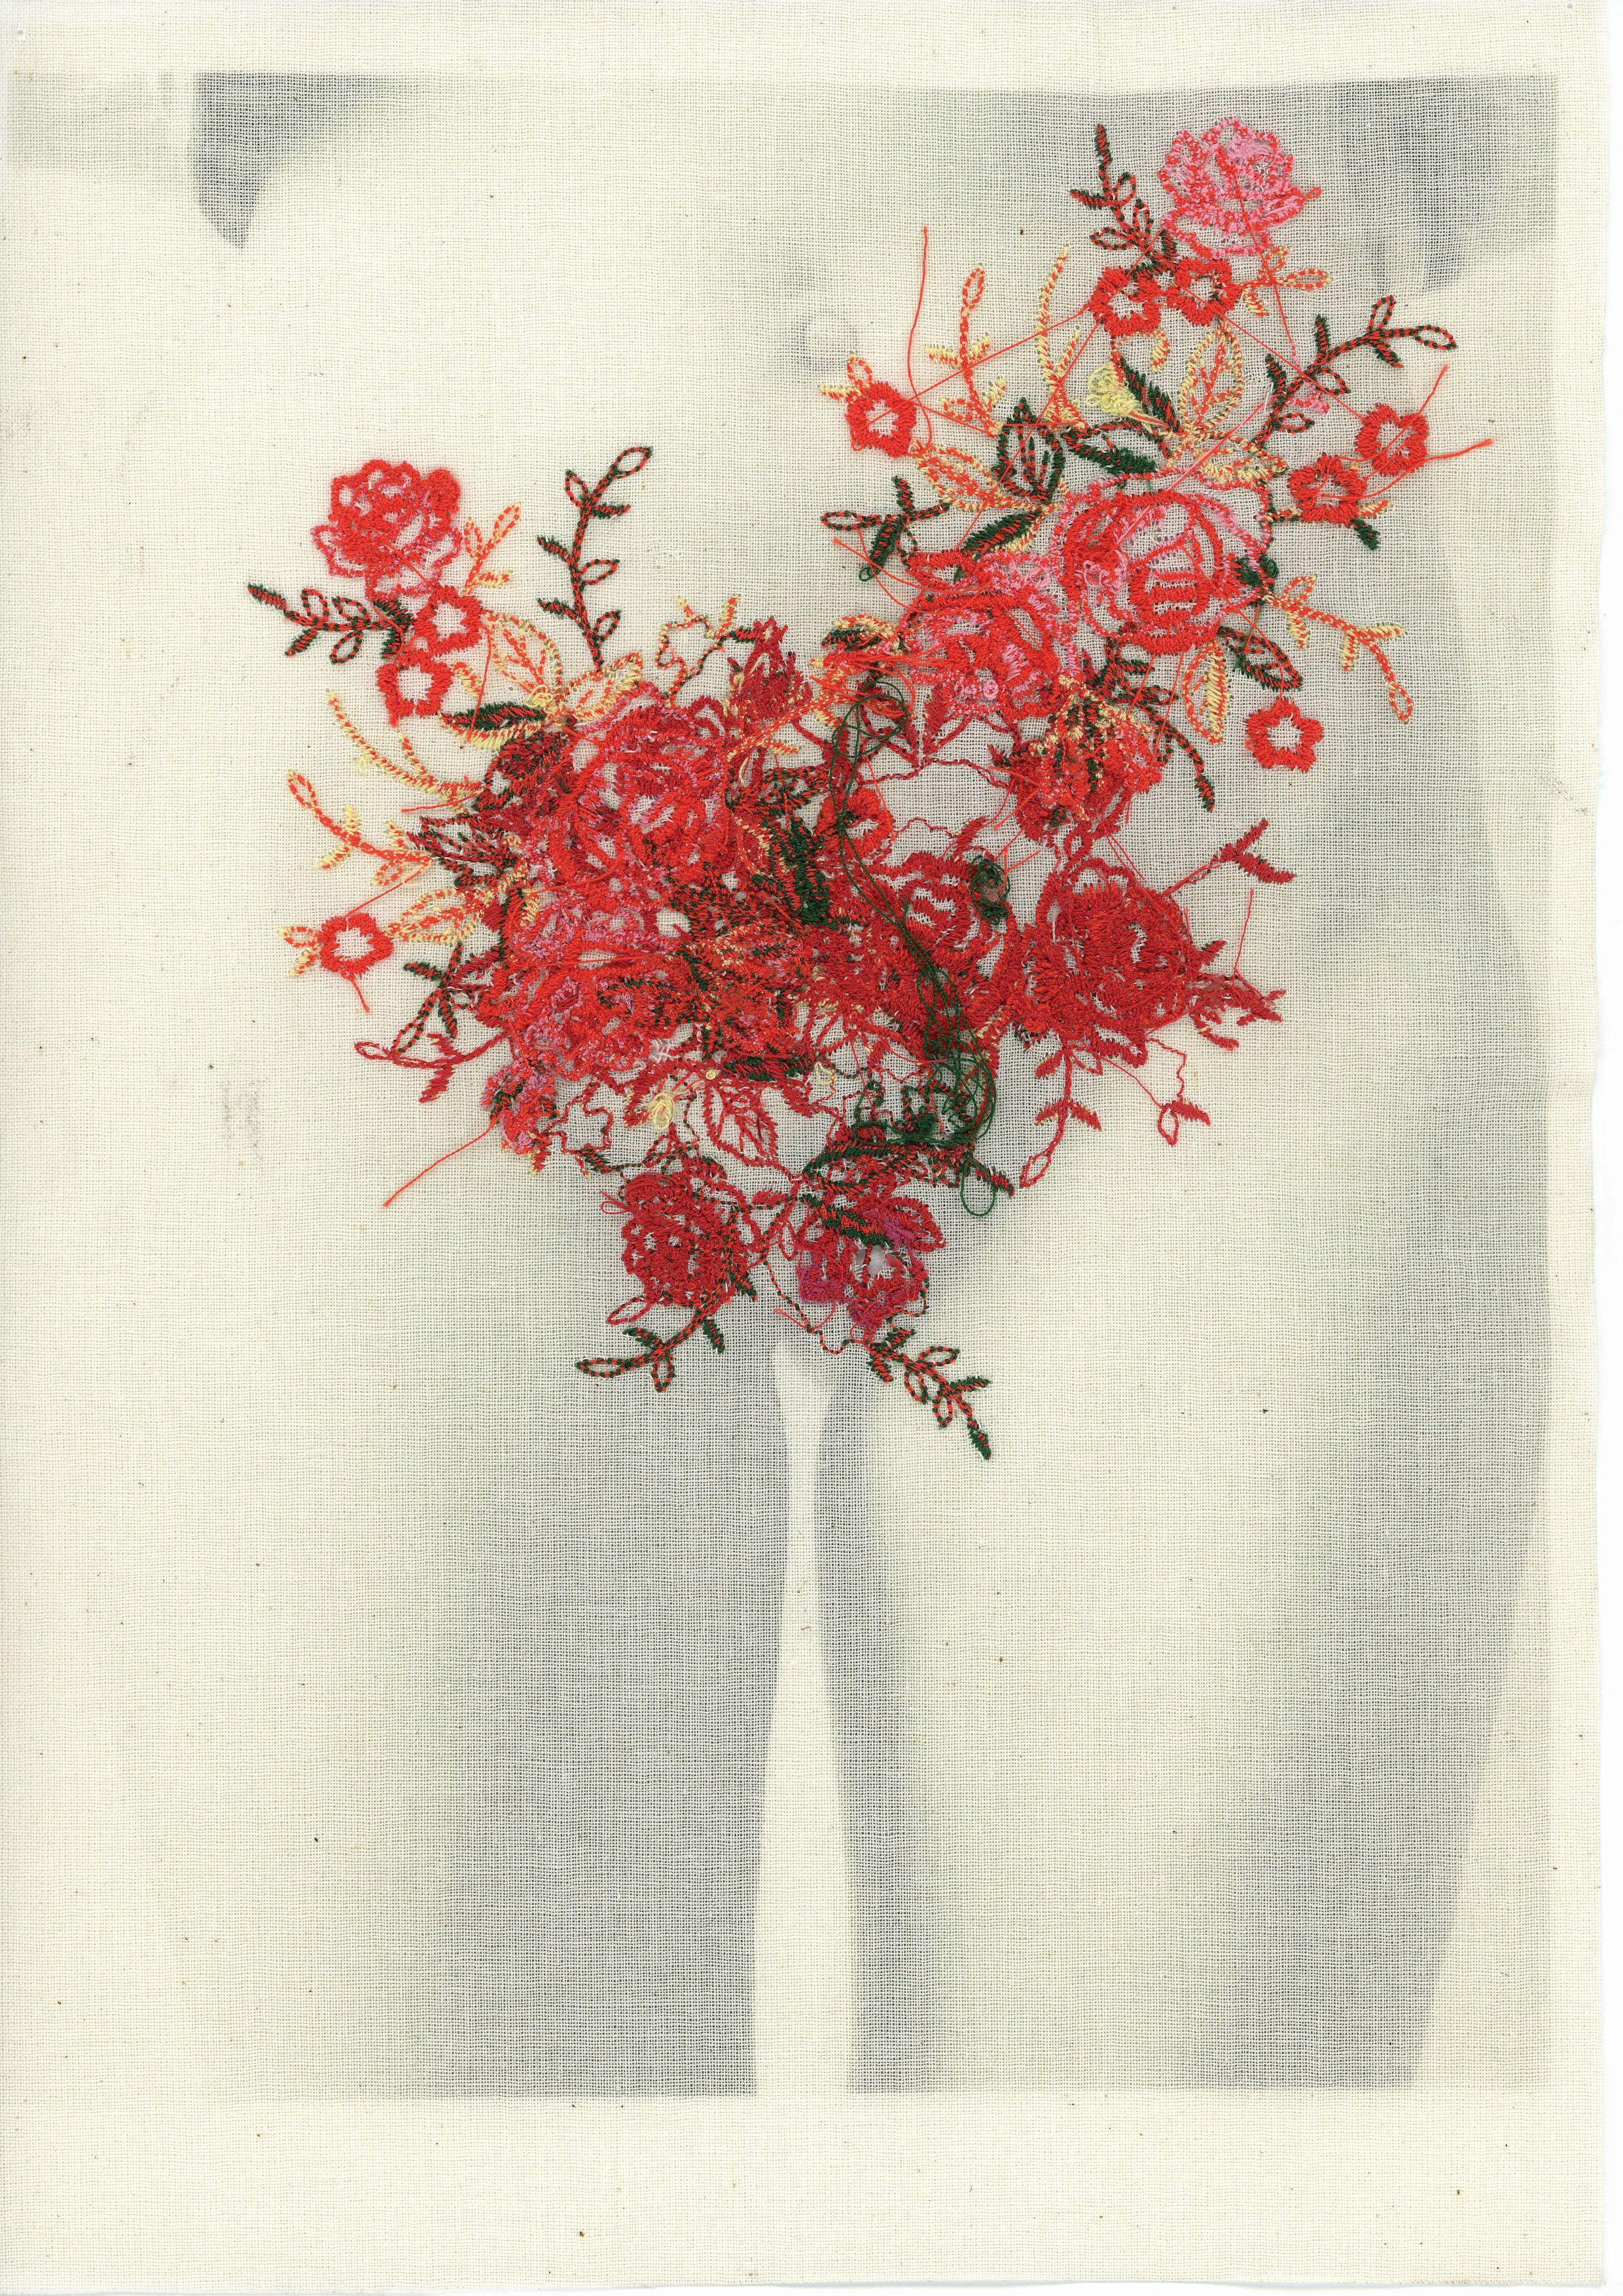 Łono natury, revers, druk na płótnie, haft. 29 x 21 cm, 2014/16